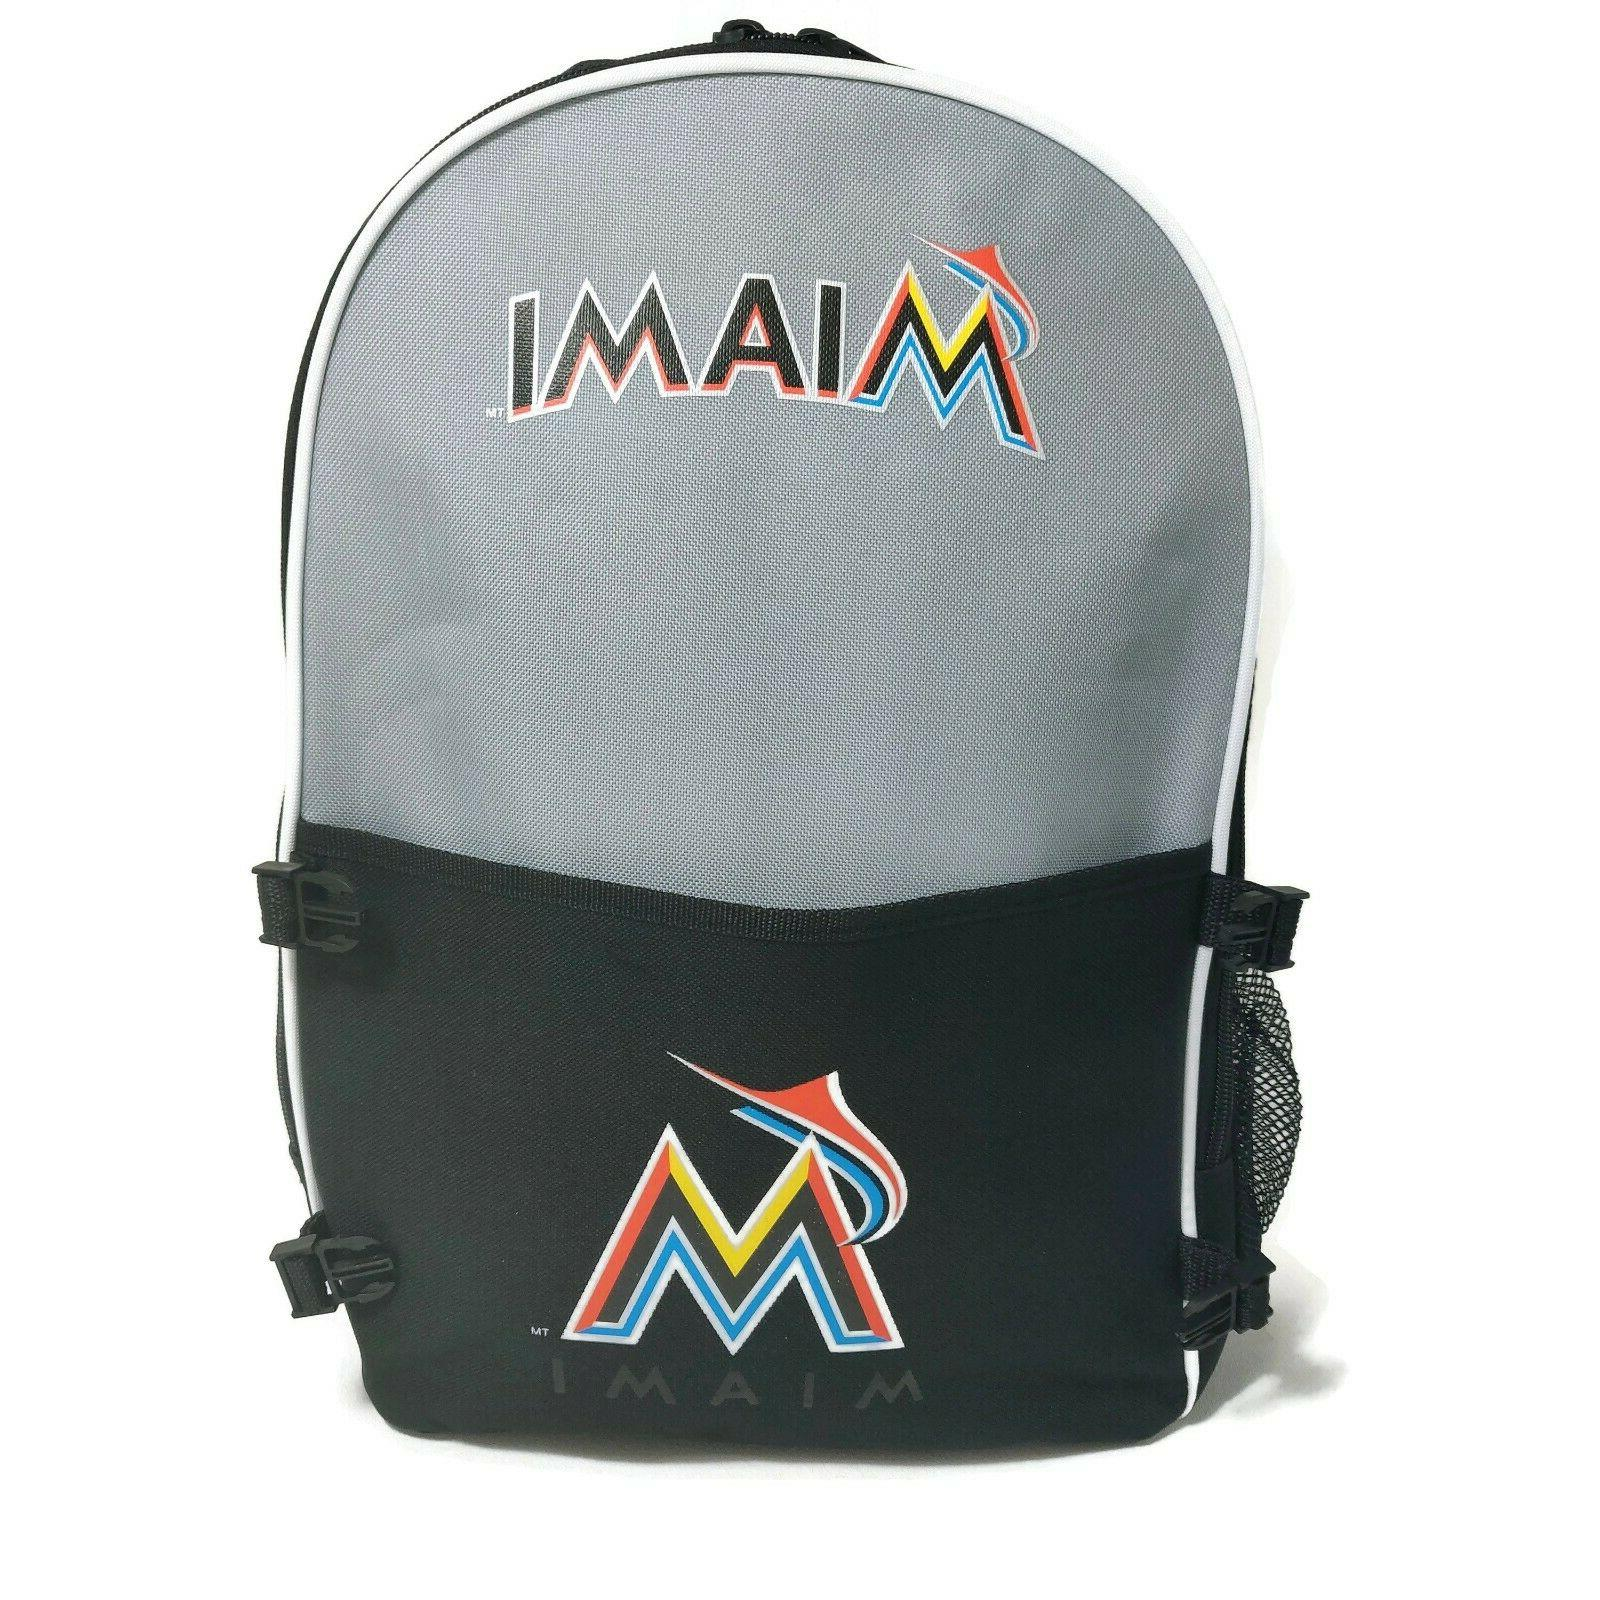 Miami MLB School Detachable Lunch NEW